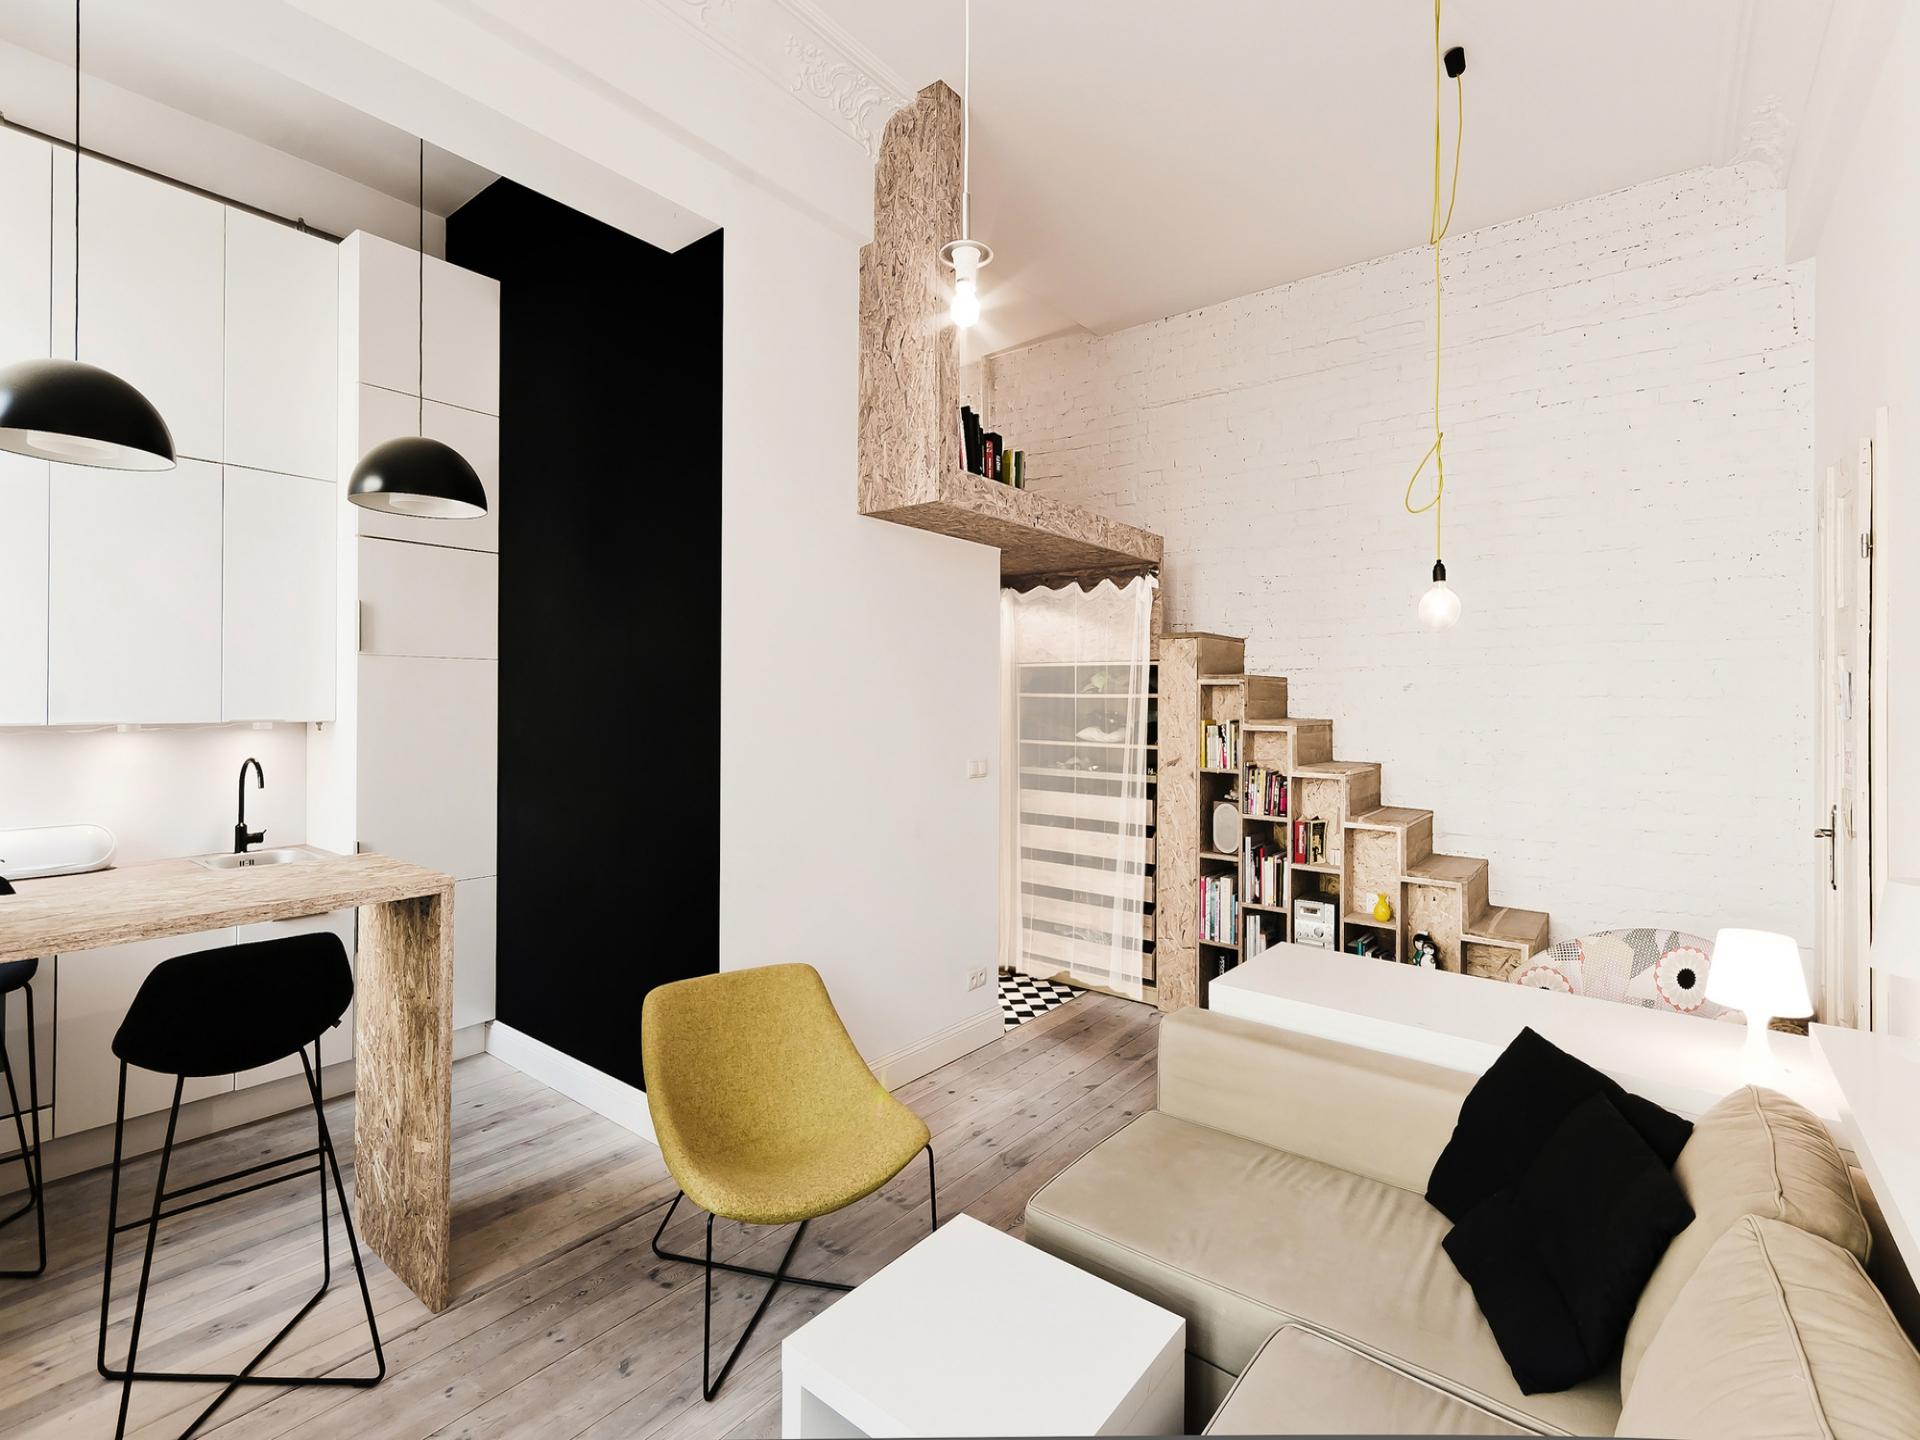 Интерьер двухуровневой маленькой квартиры